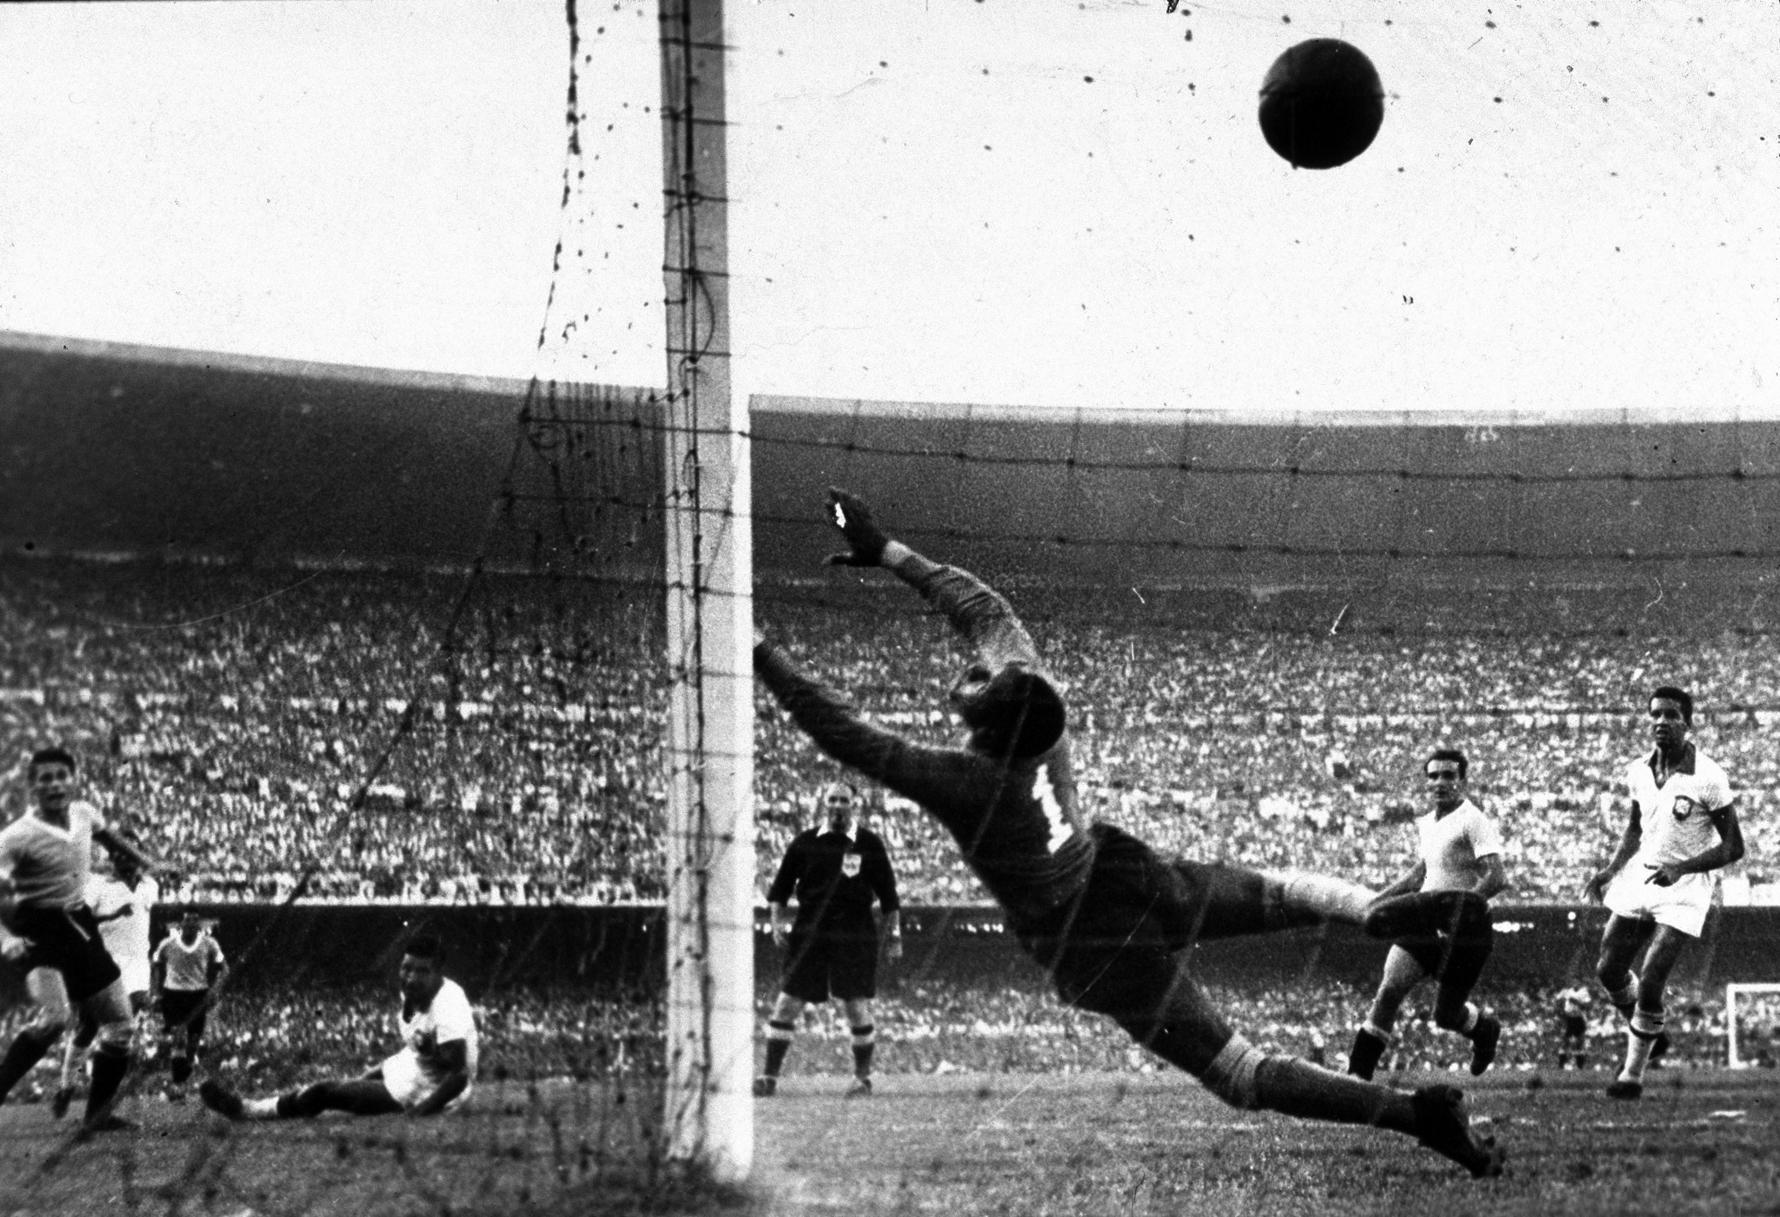 Brésil-Uruguay Coupe du monde de football 1950